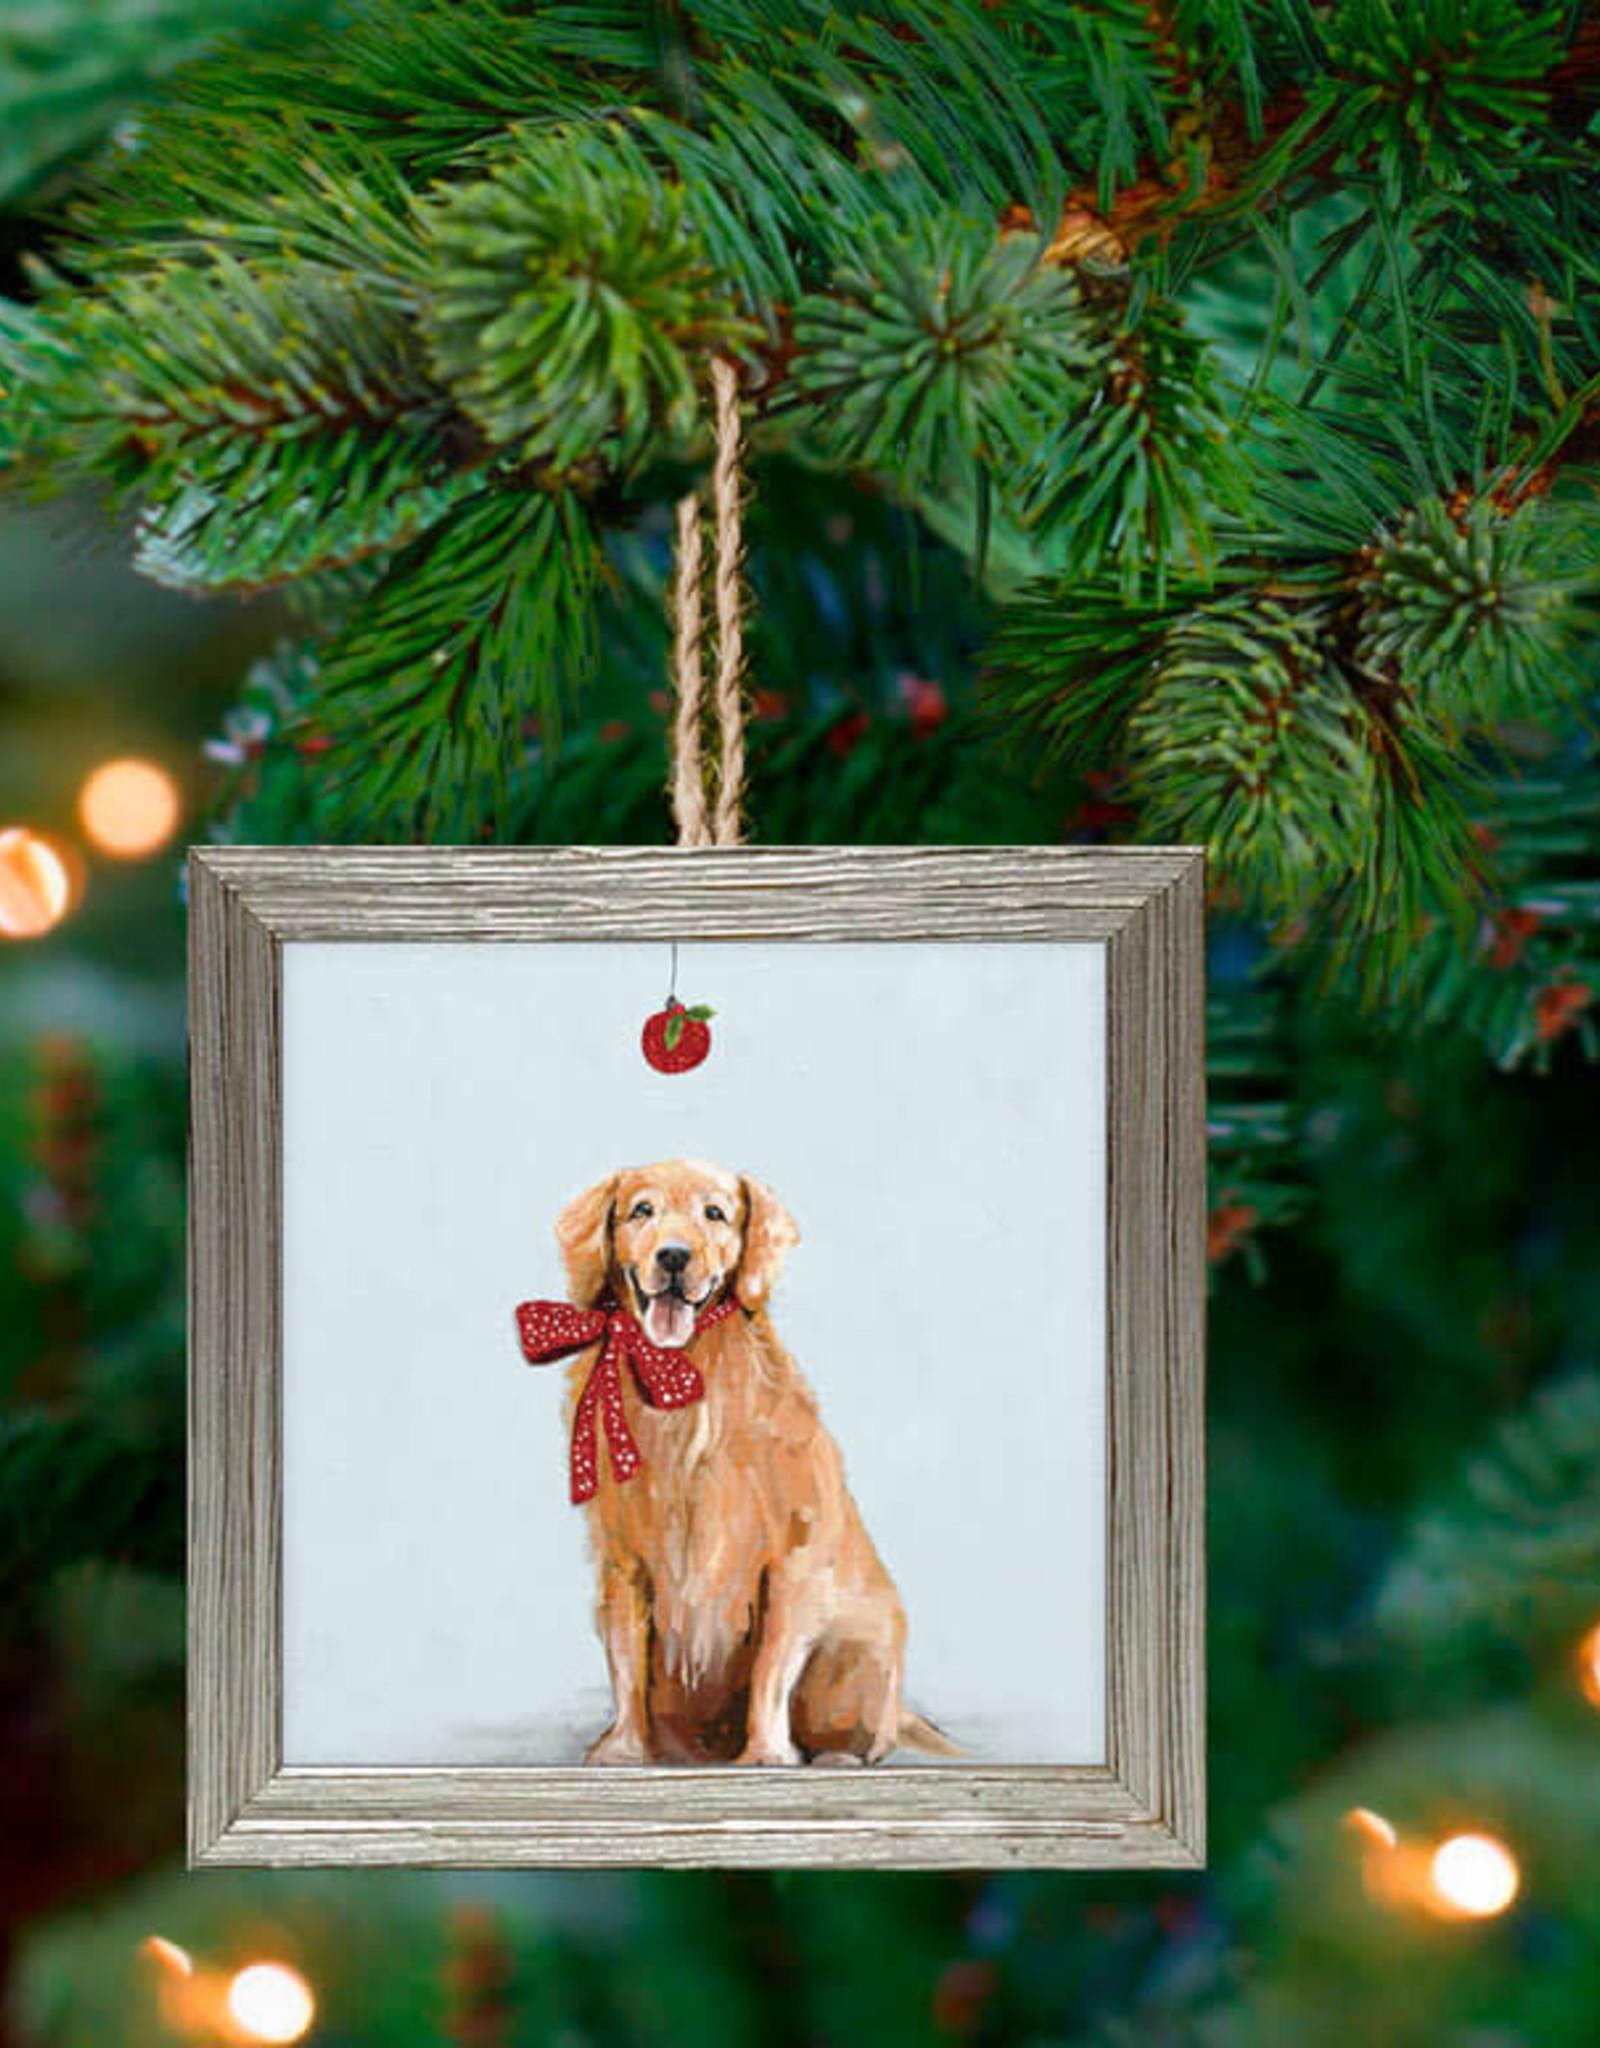 Greenbox Art Holiday - Festive Golden Retriever Embellish Framed Wooden Ornament